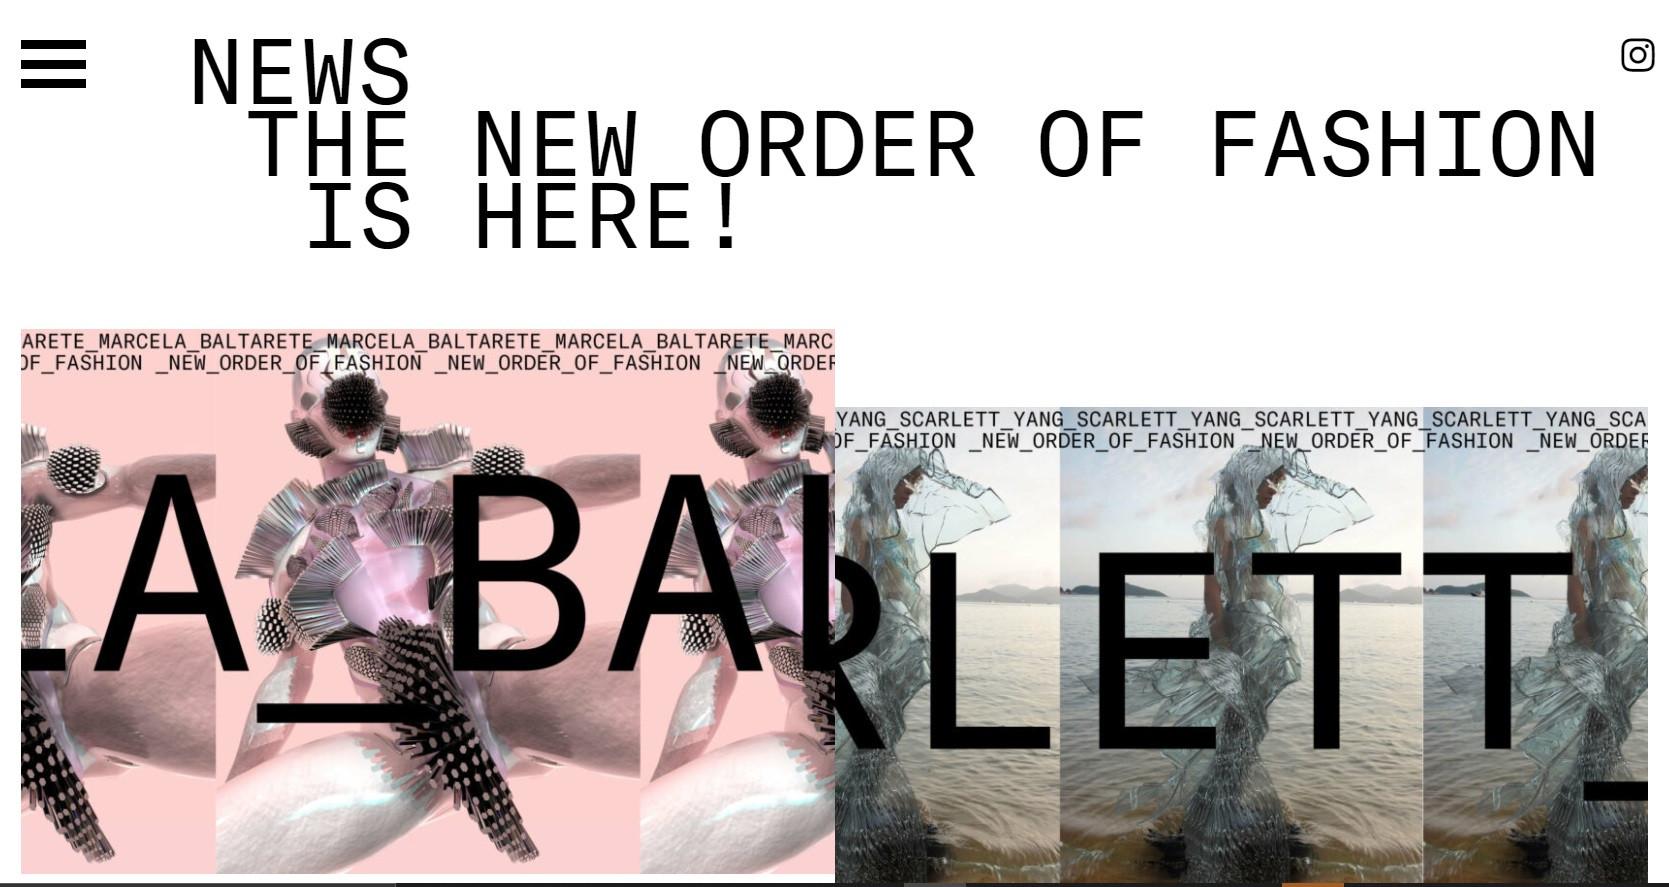 new order of fashion.jpg